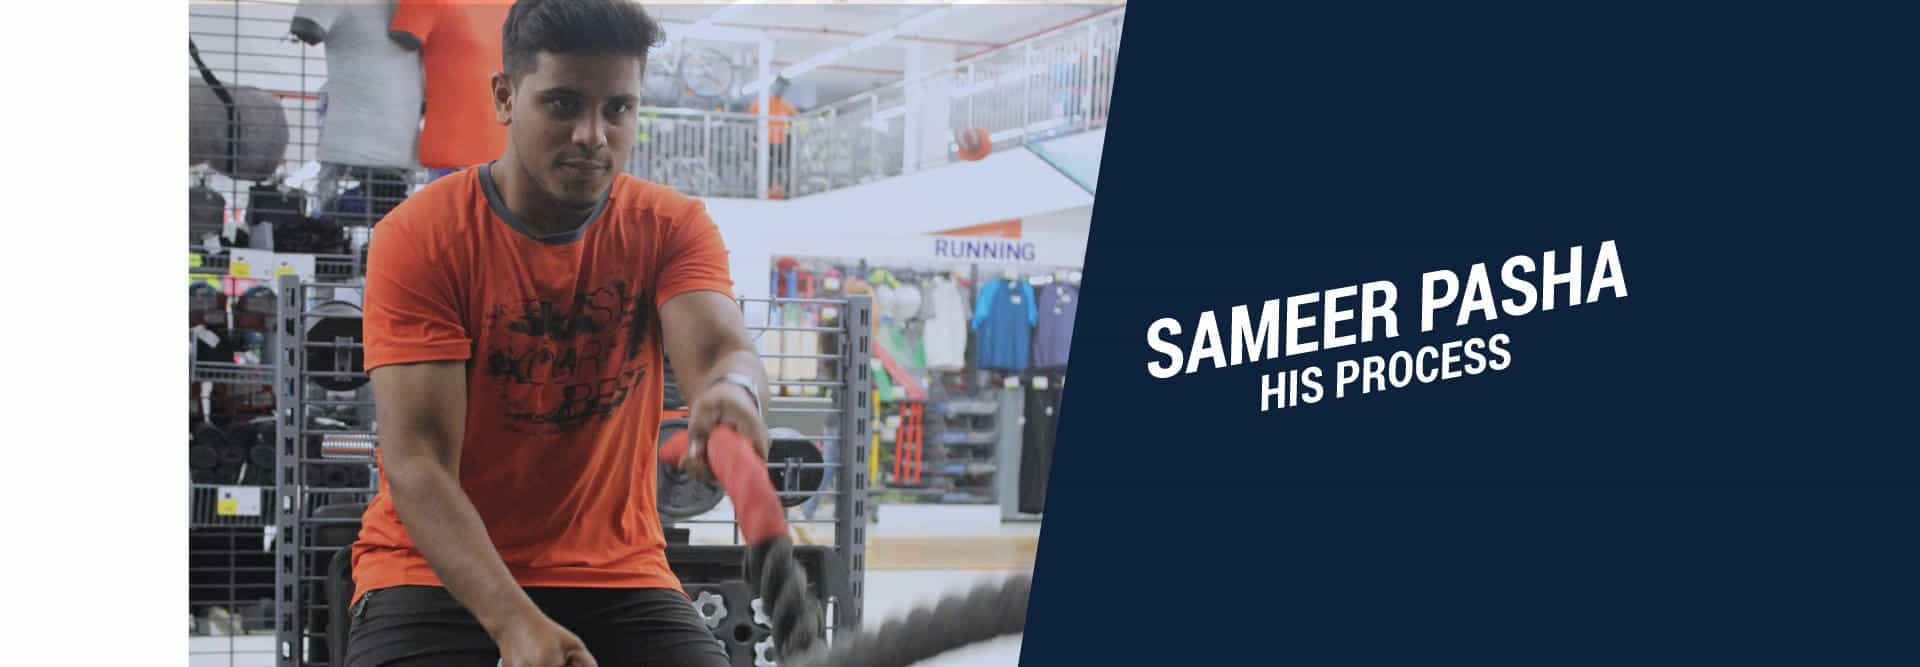 Sameer Pasha - His Process